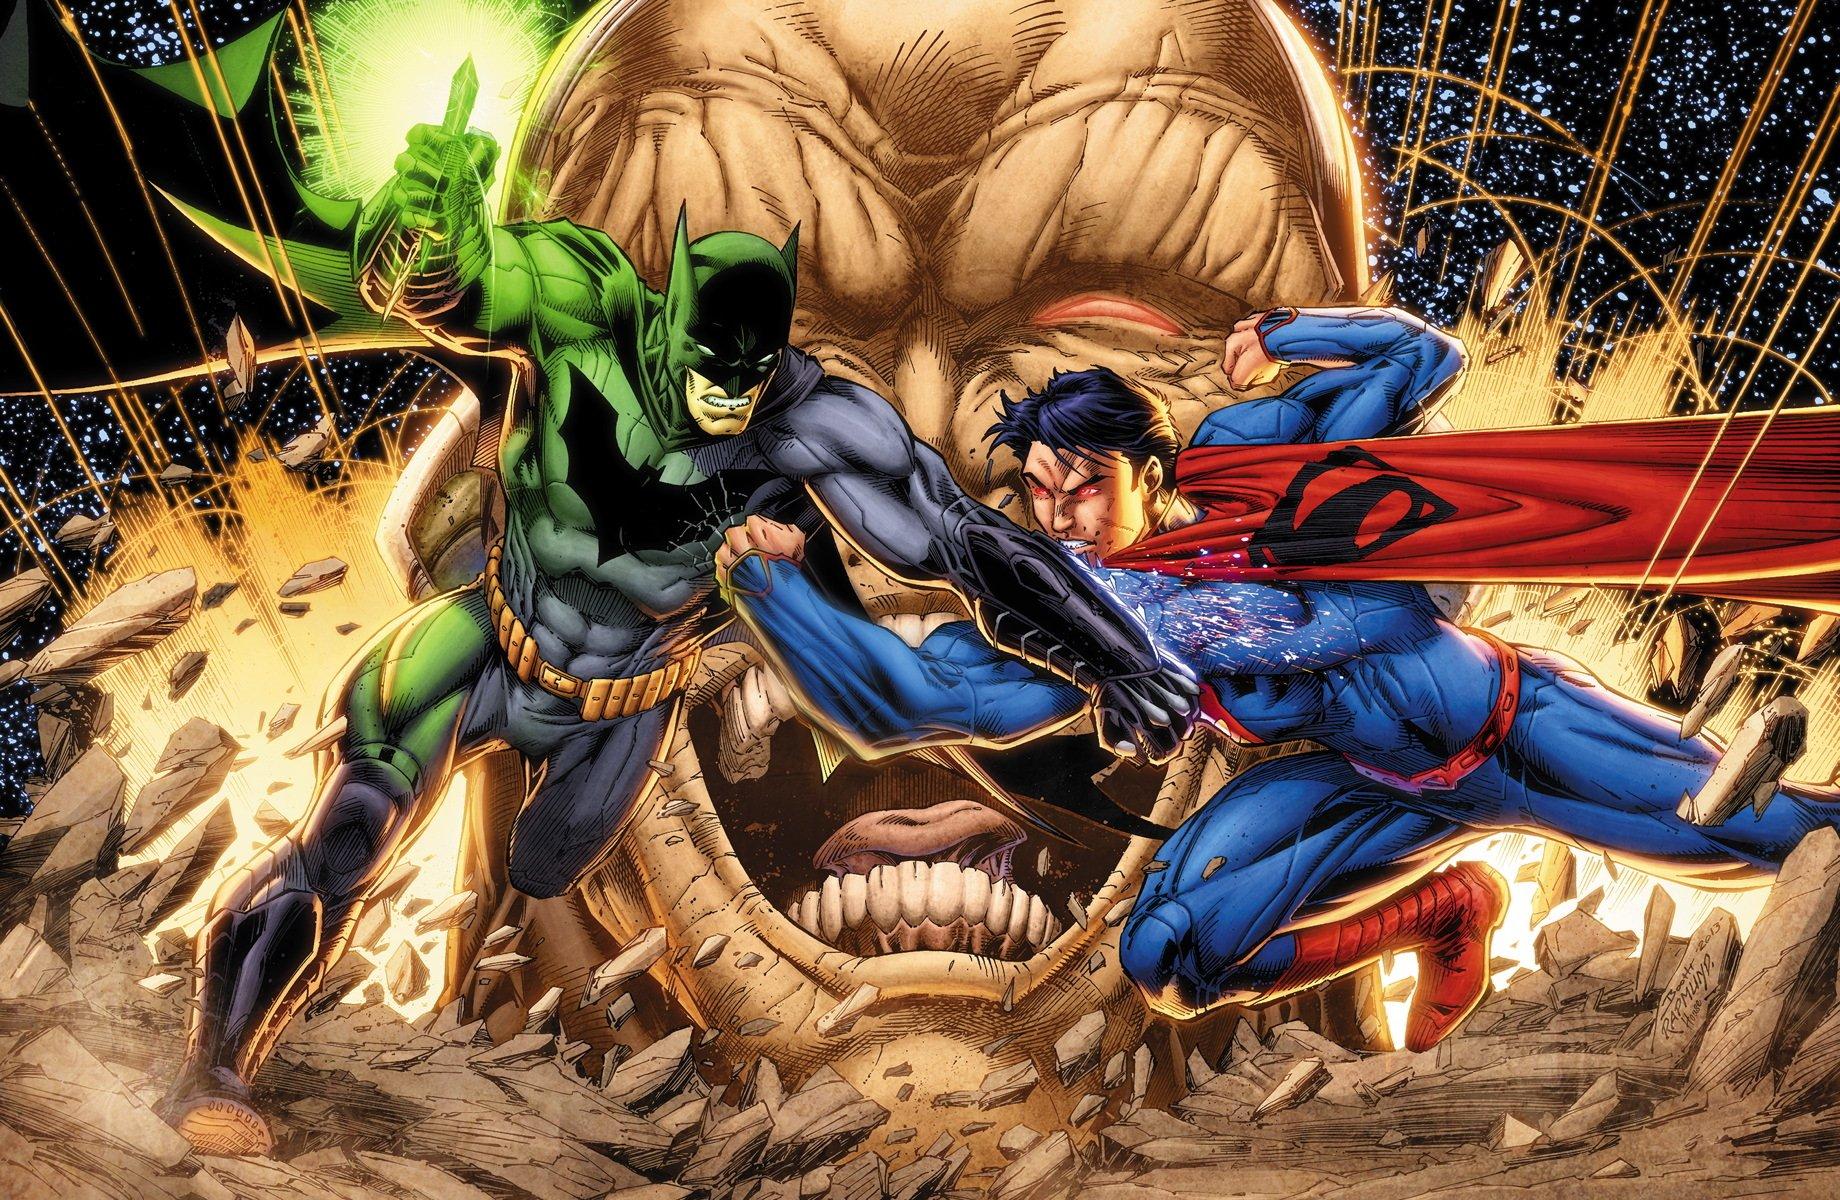 10 Batman Vs Superman Hd Wallpapers Background Images